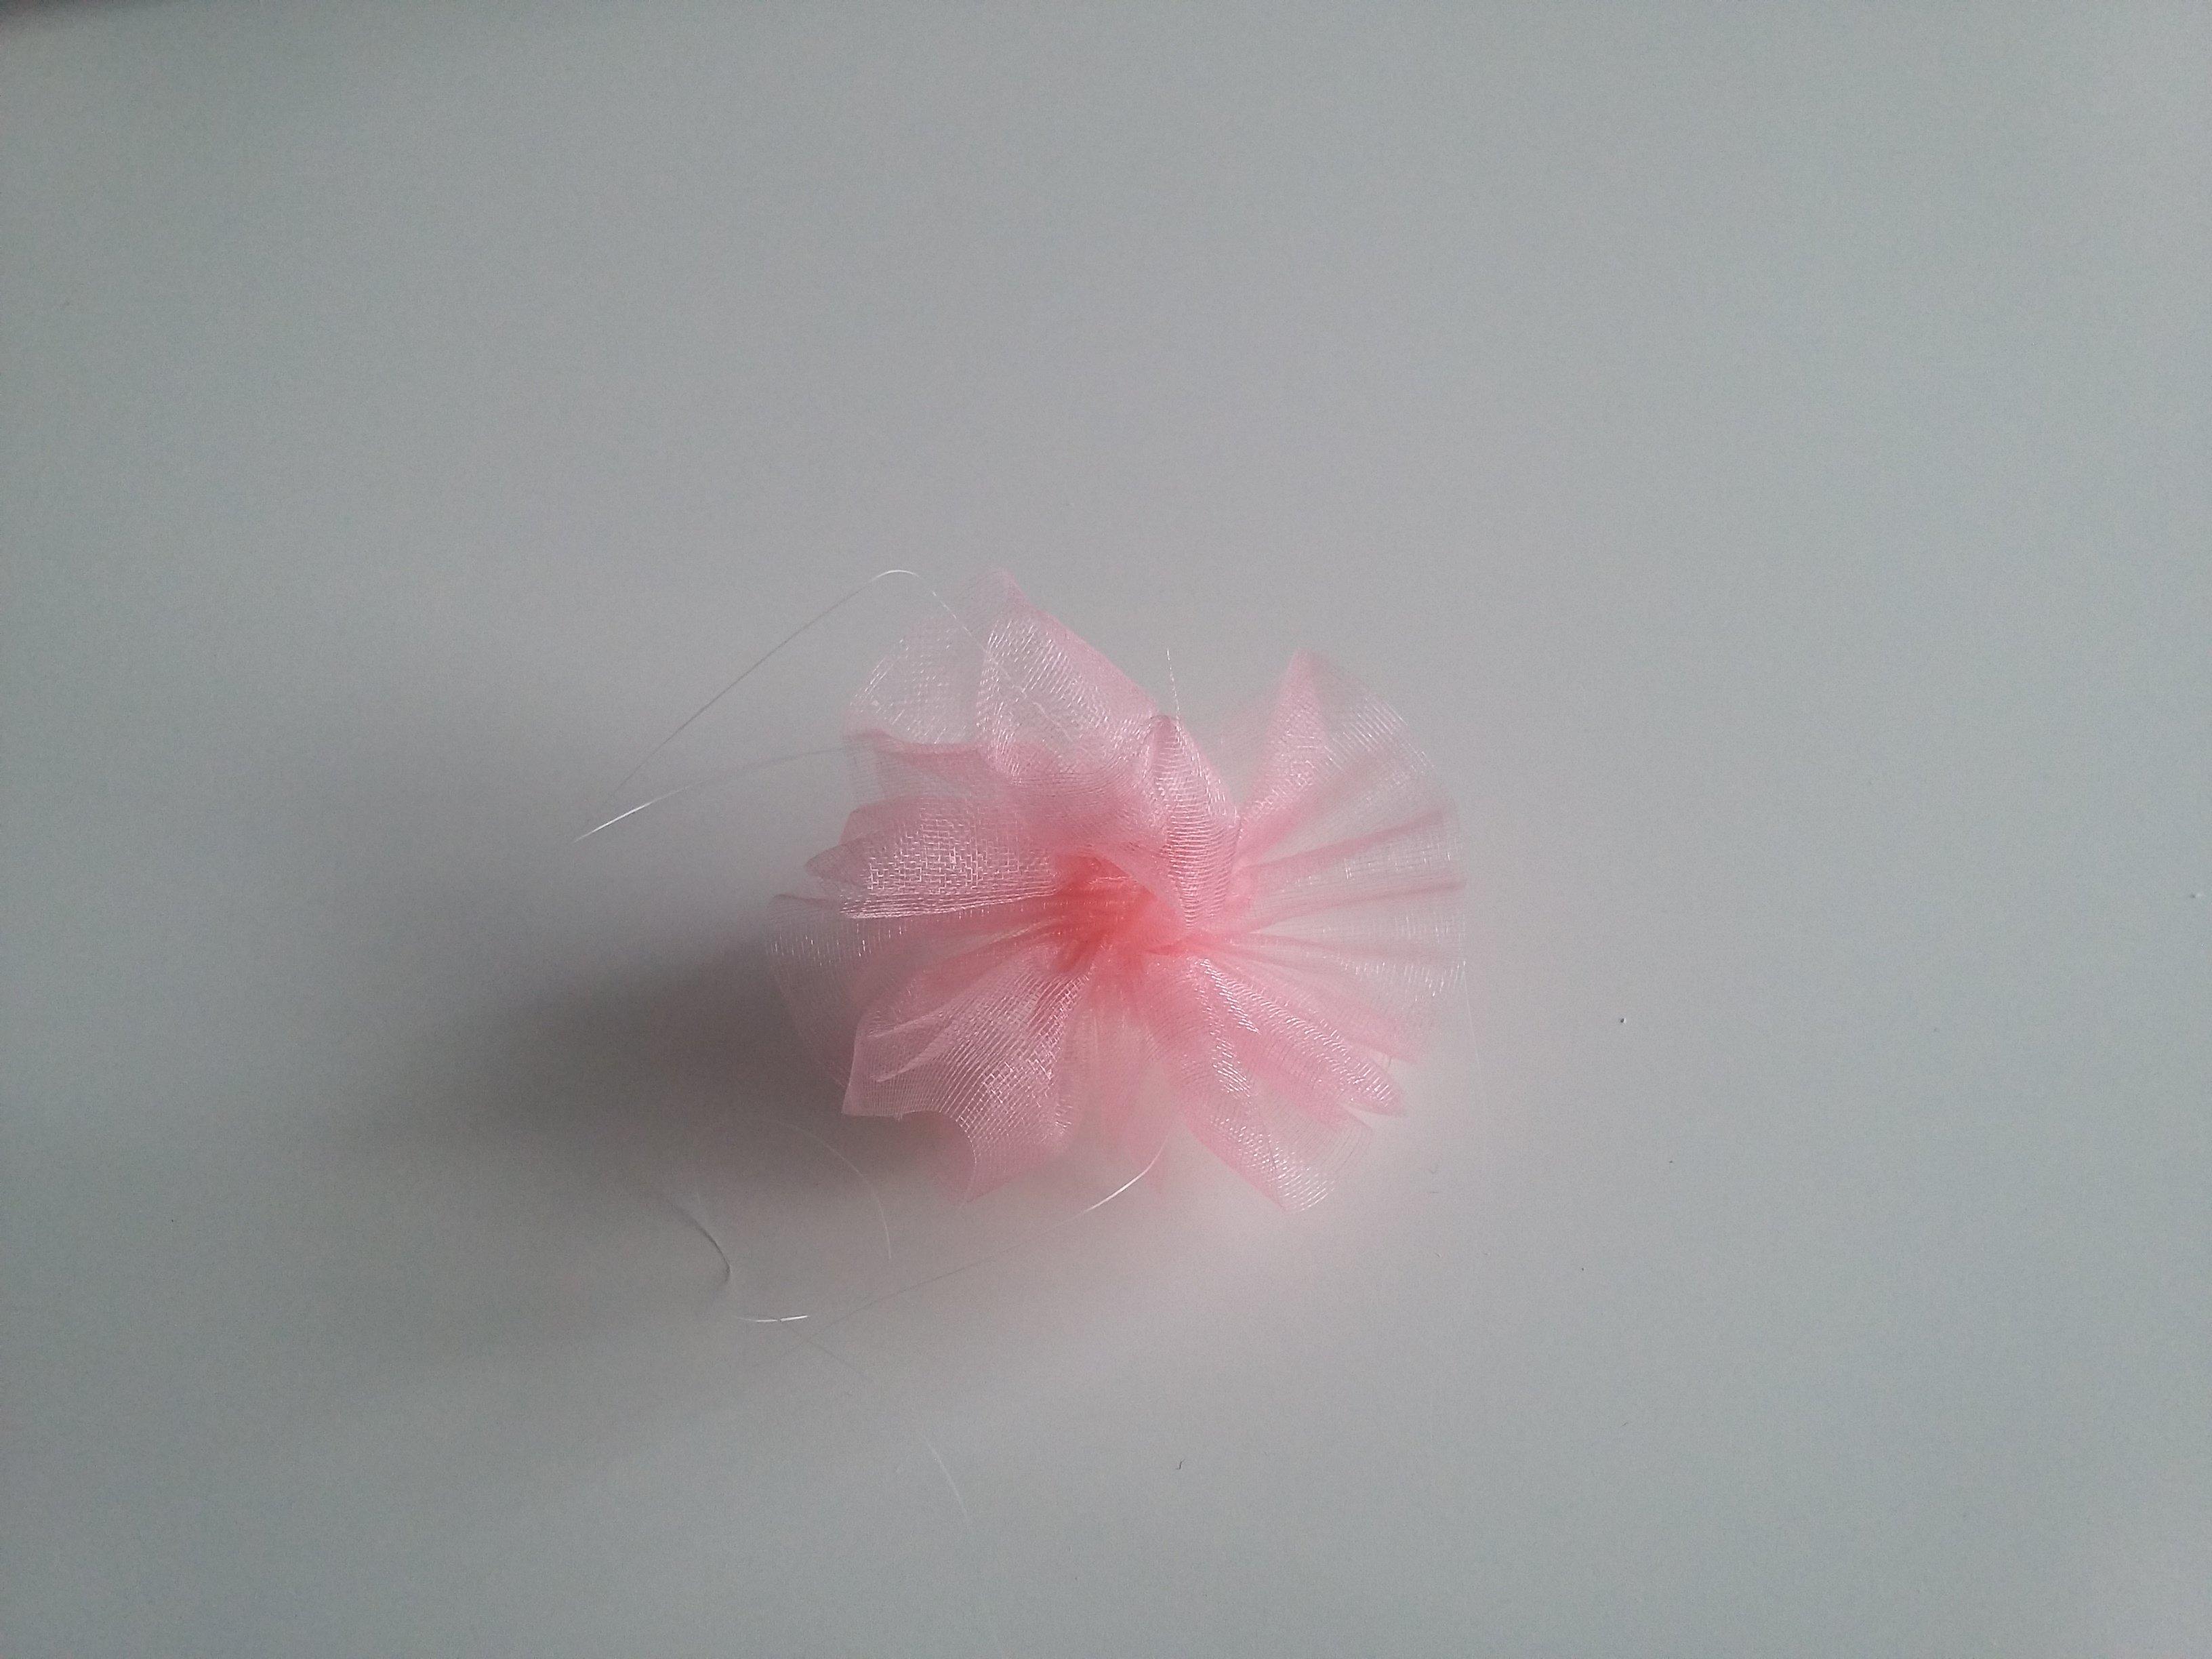 Bullesdeplume bandeau floral organza fleur ok